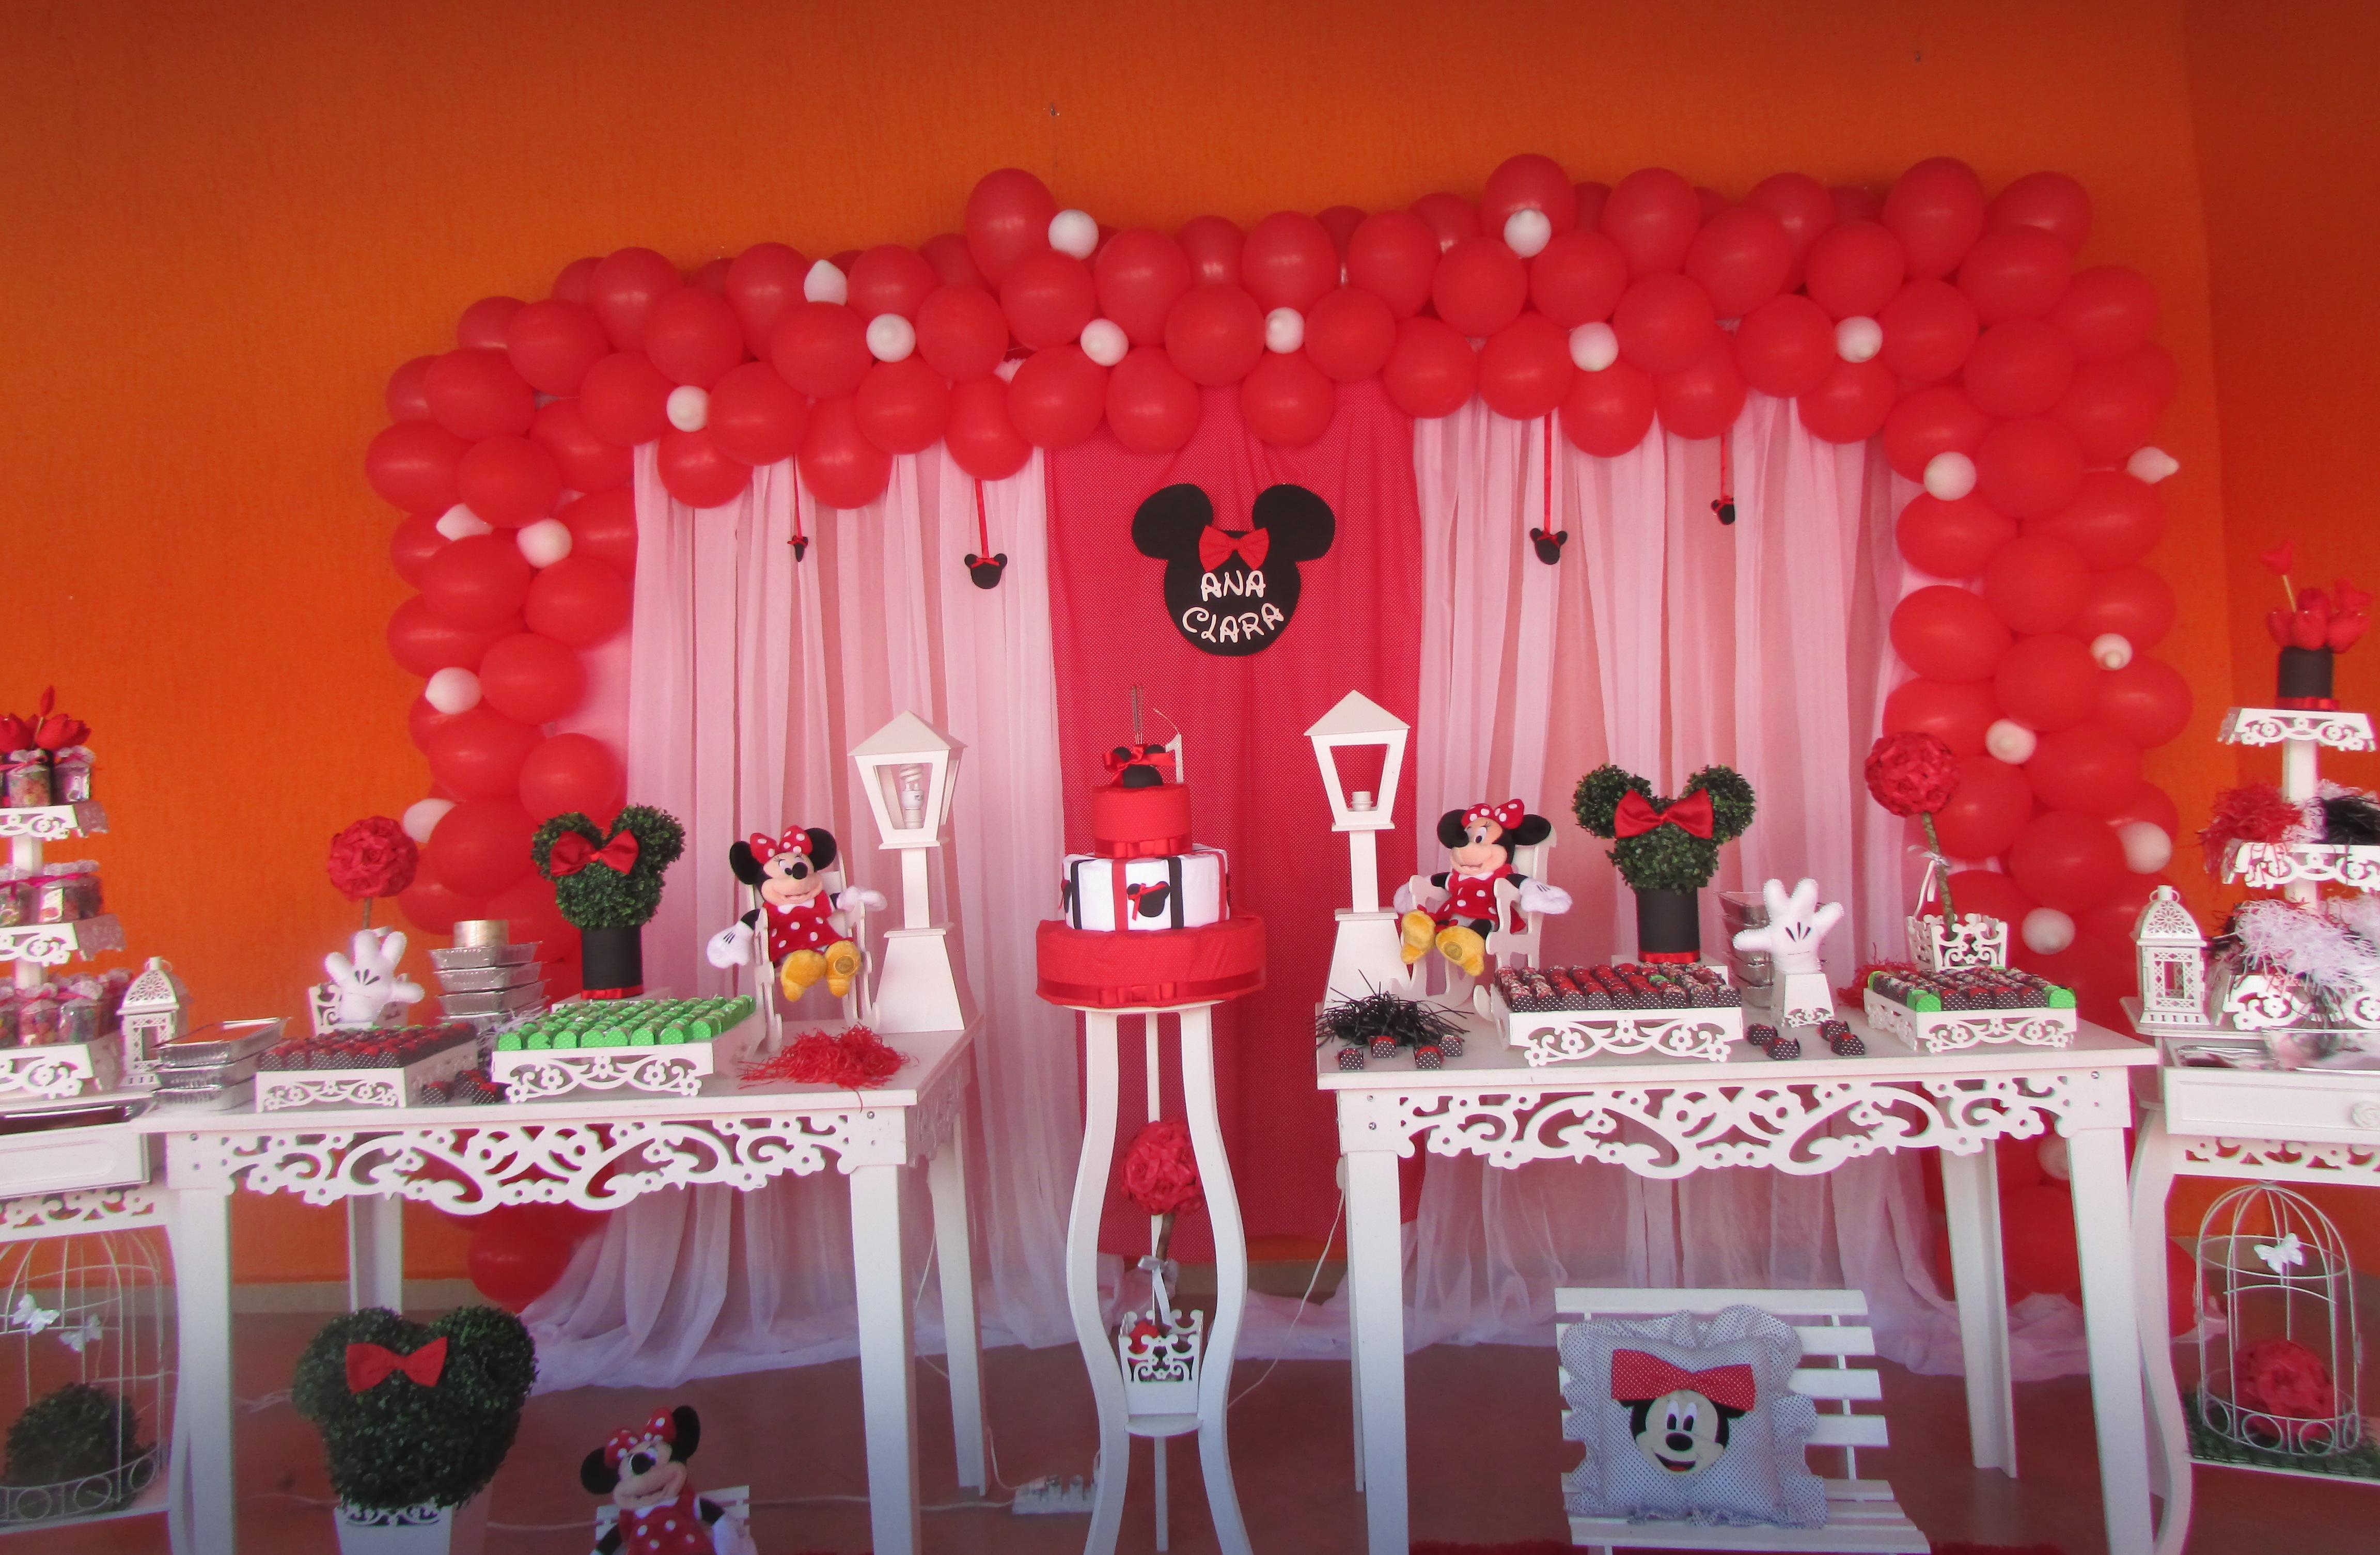 decoracaoprovencalminnievermelha2provencalminnievermelha